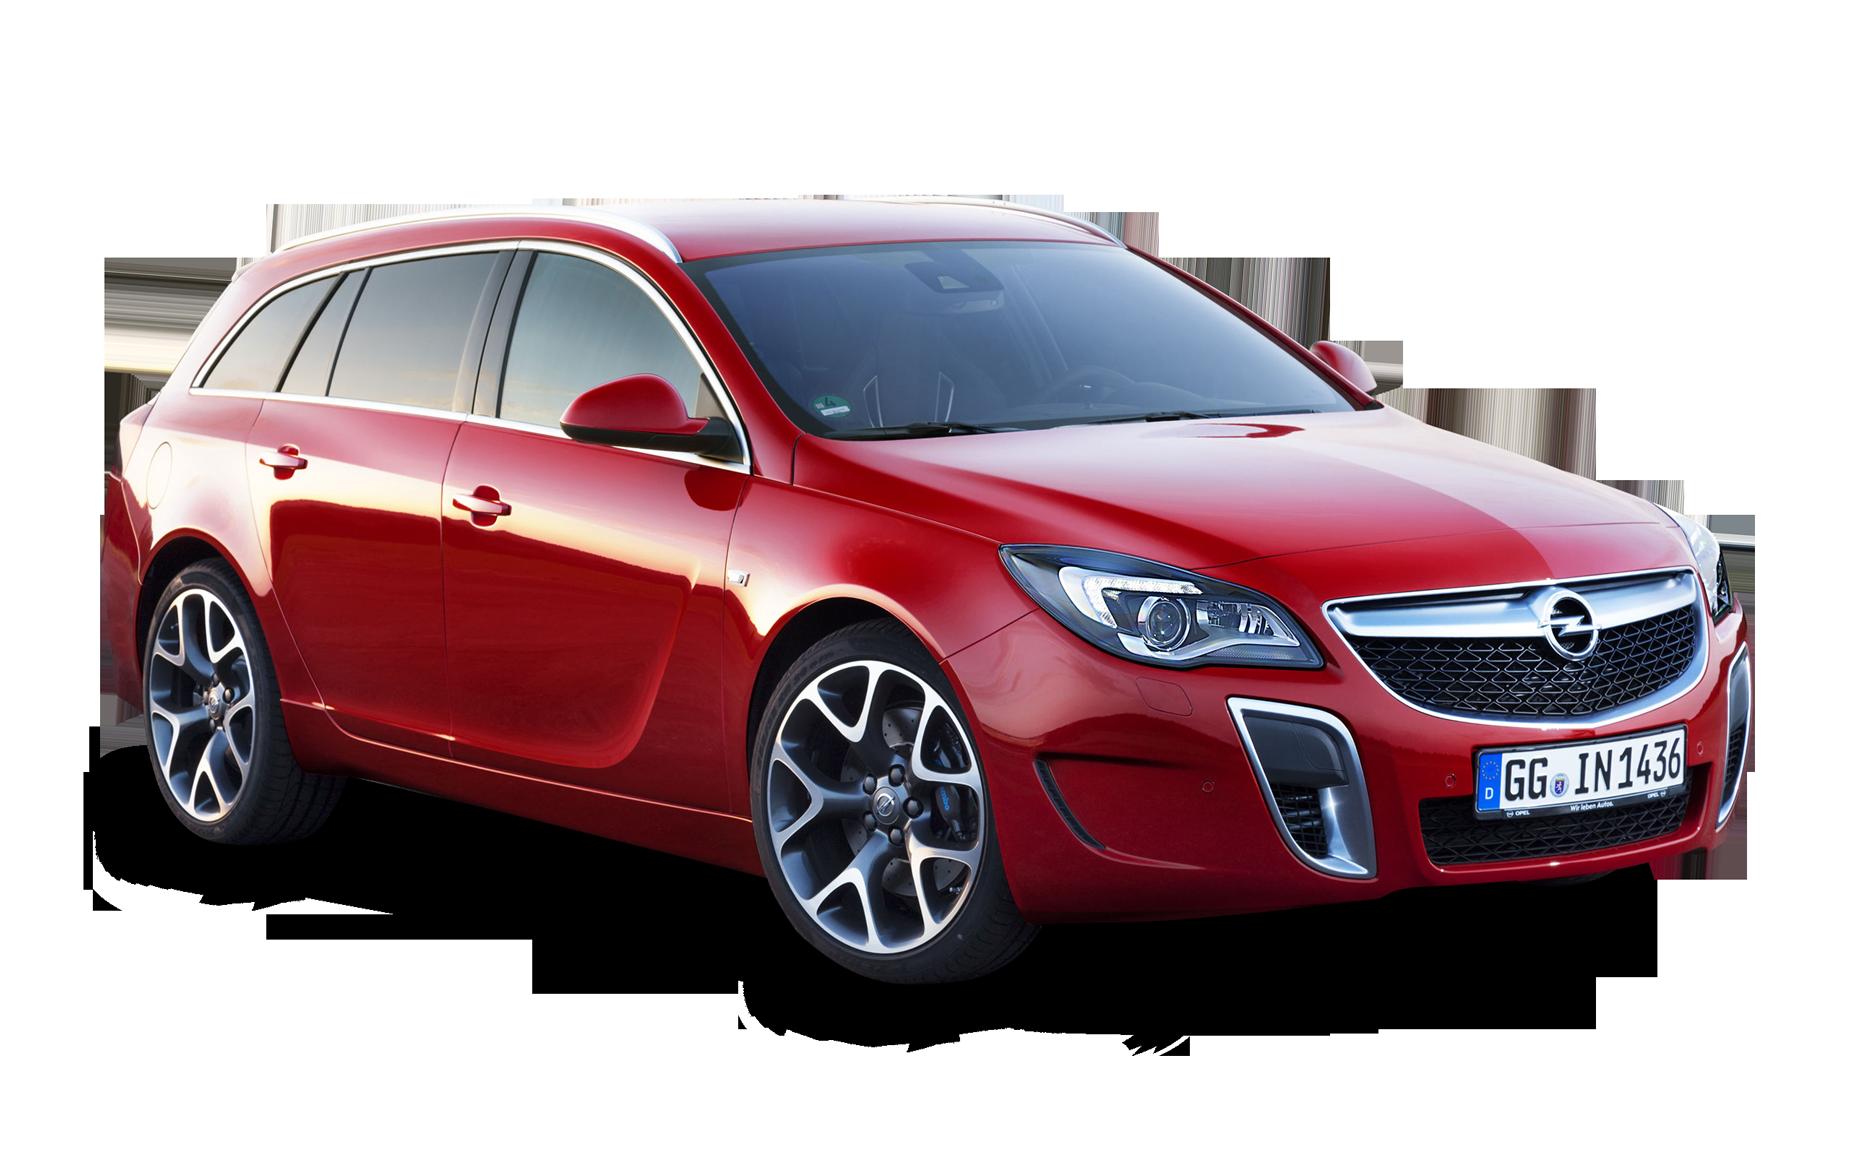 Opel Png Hdpng.com 1850 - Opel, Transparent background PNG HD thumbnail